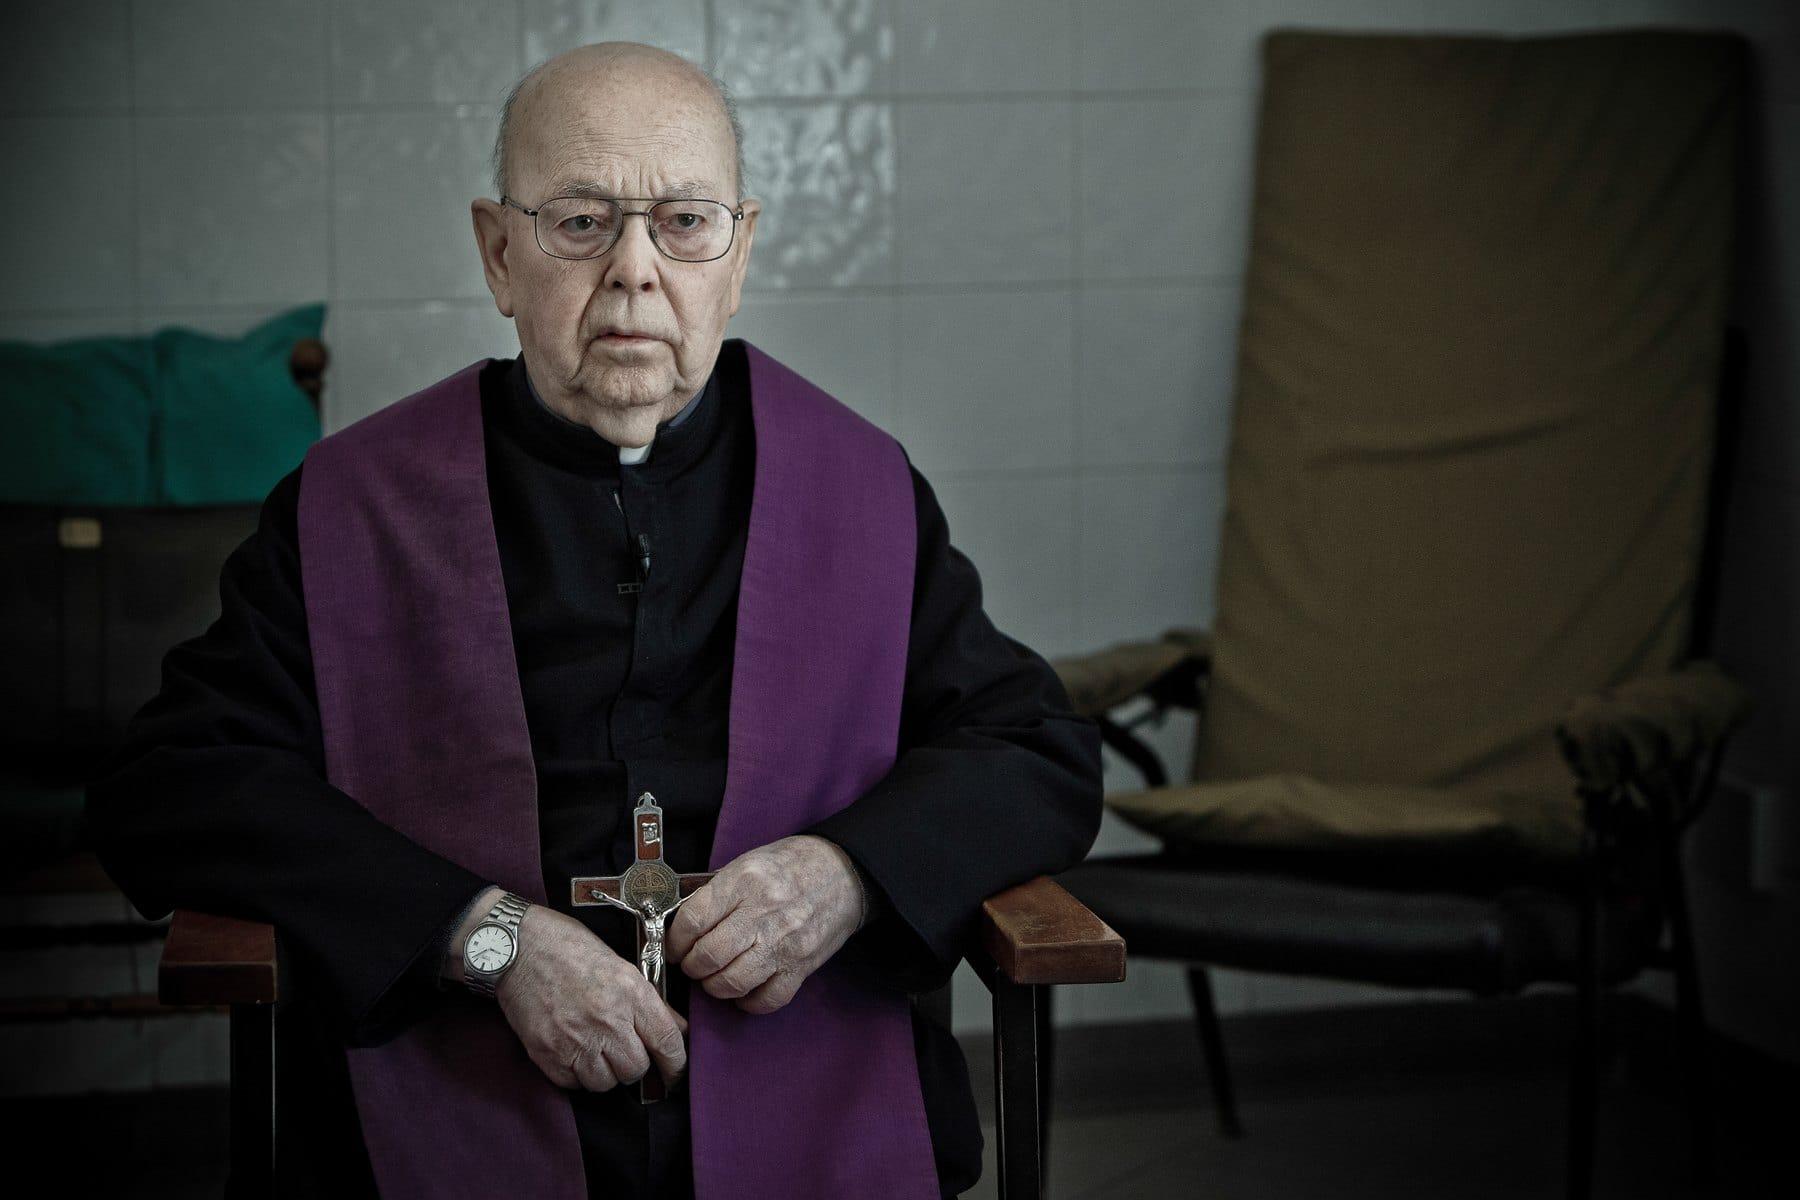 El padre Amorth realizó alrededor de 70 mil exorcismos.